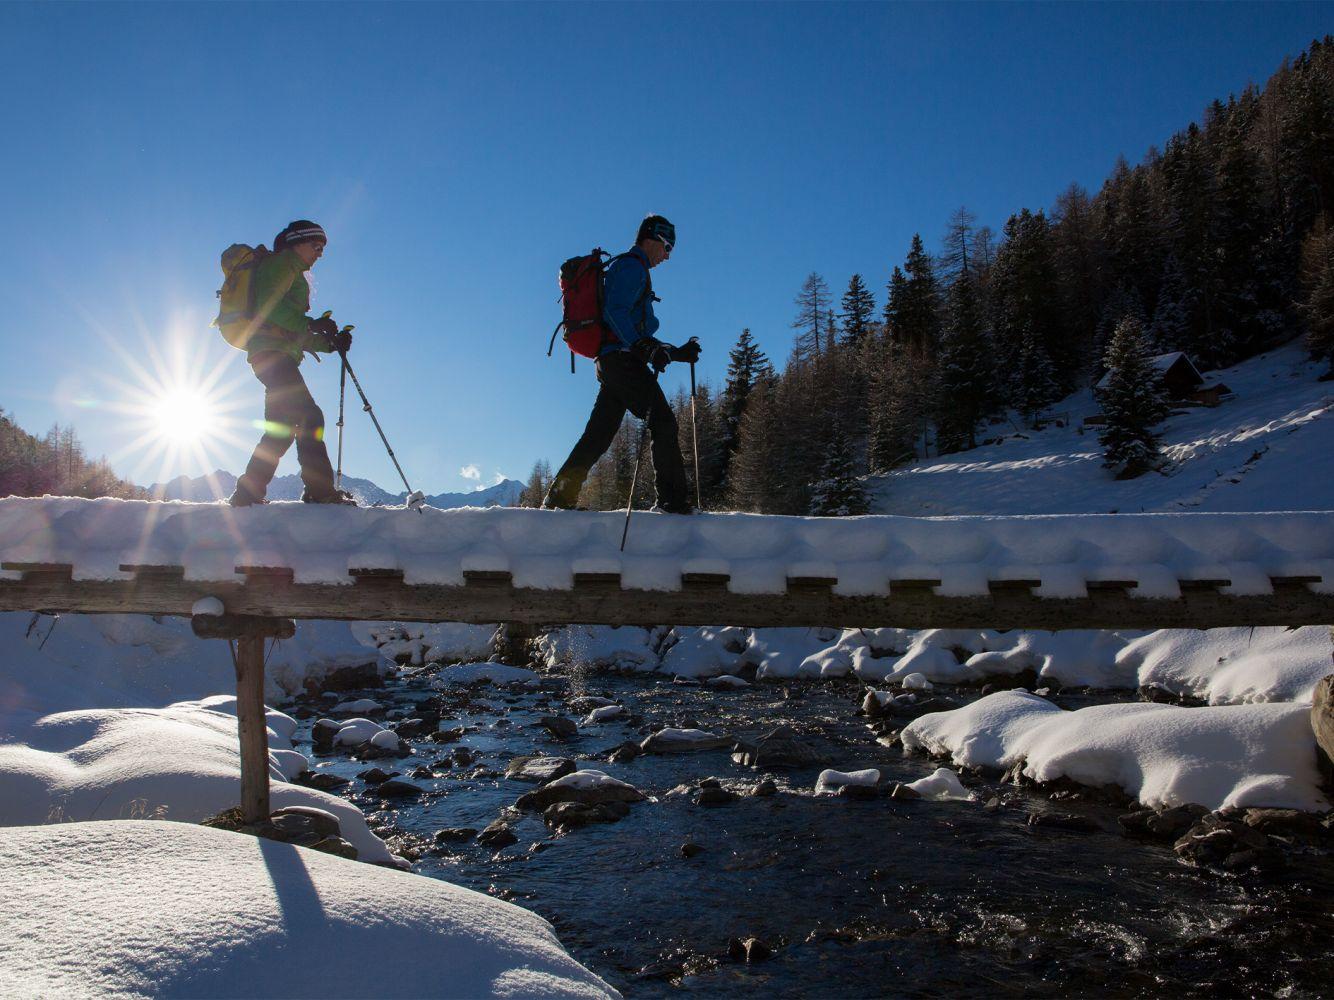 Schneeschuhwandern in Winterlandschaft